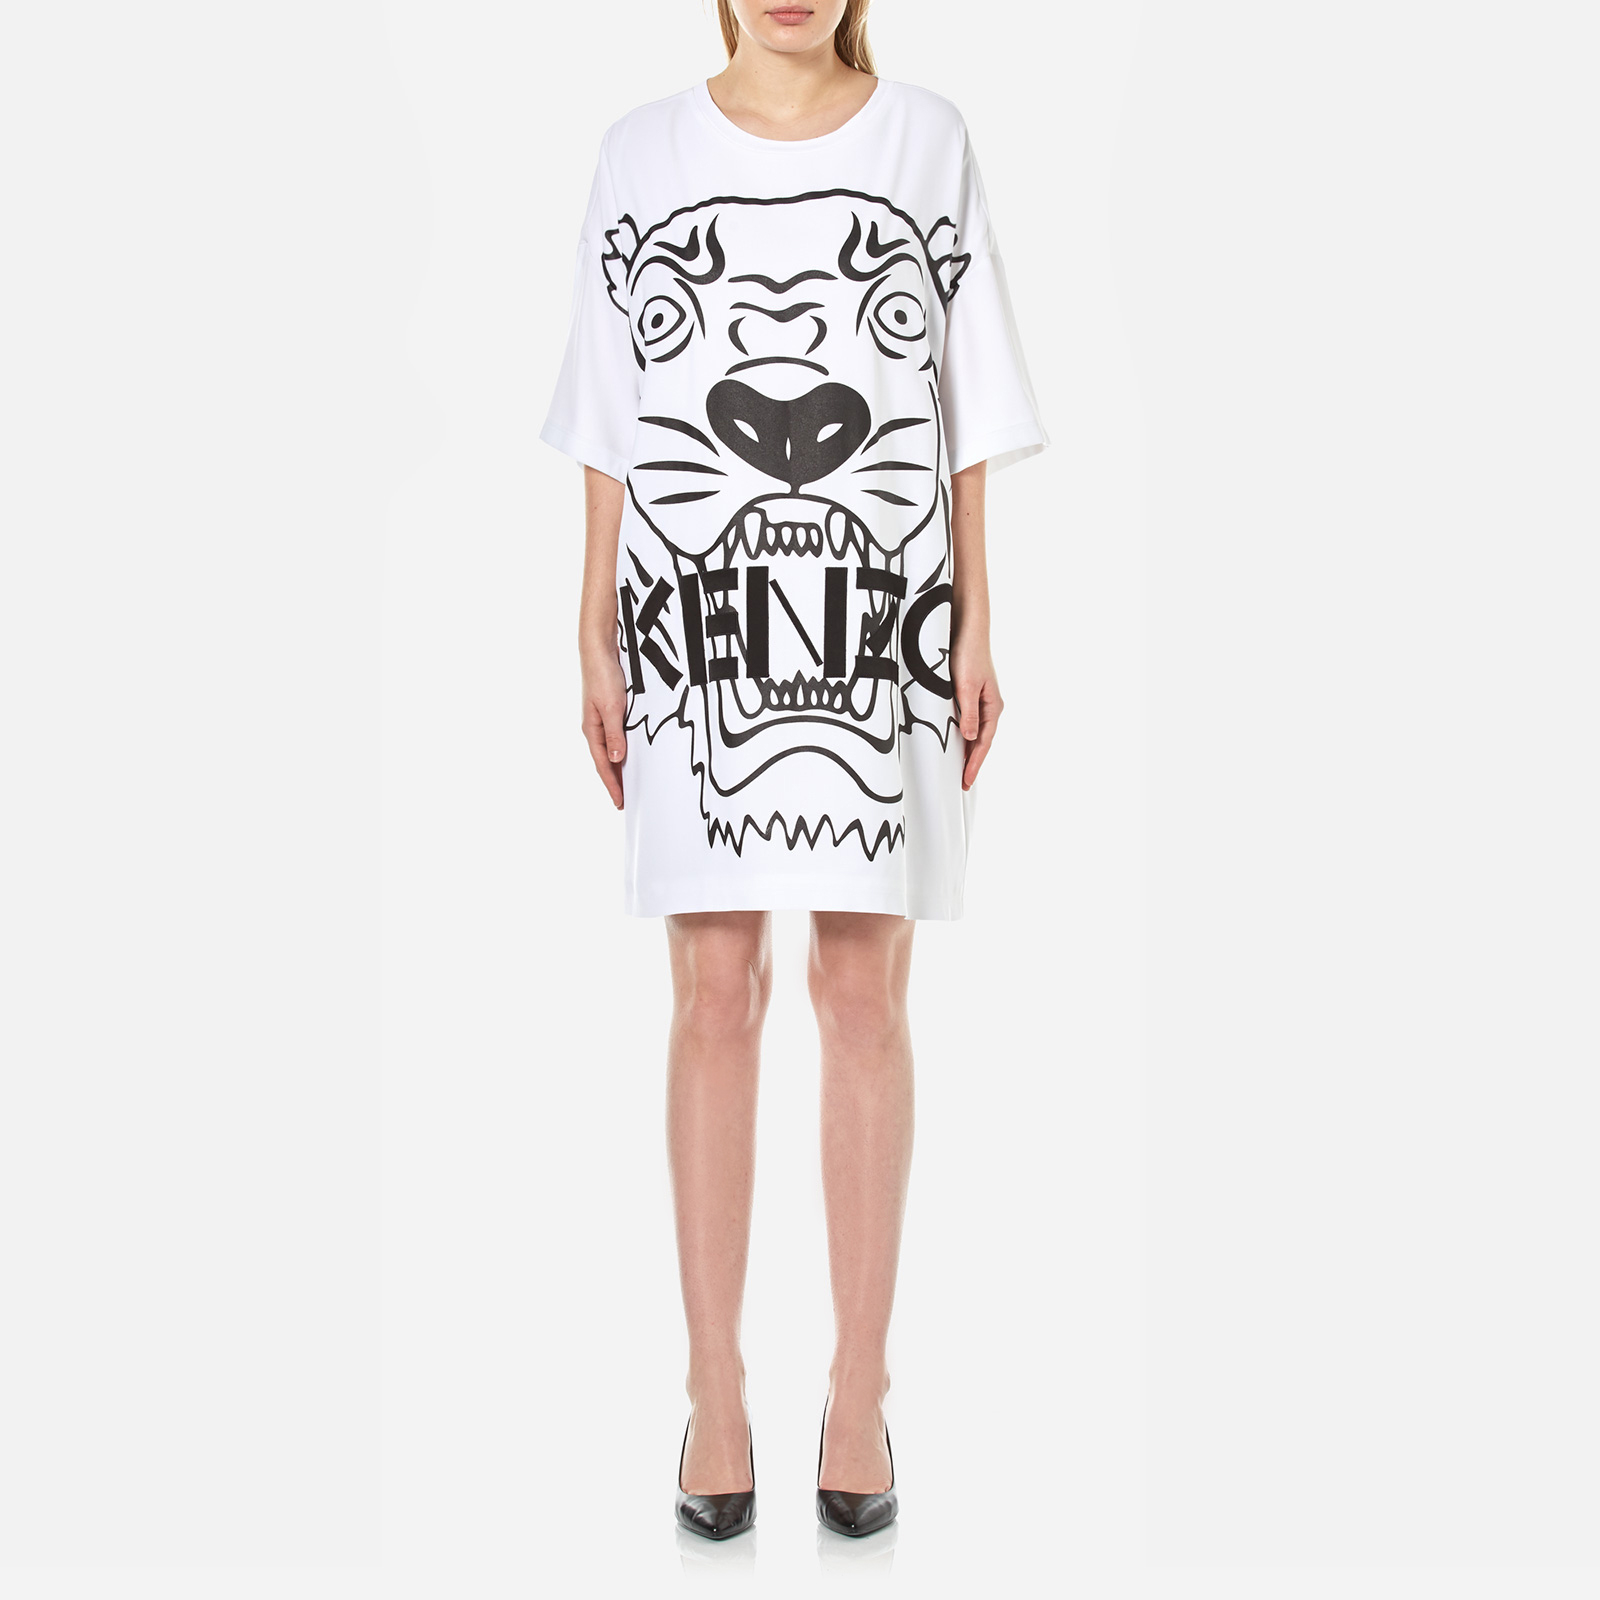 2b88c883d9bd KENZO Women's Crepe Back Satin Tiger T-Shirt Dress - White - Free UK  Delivery over £50